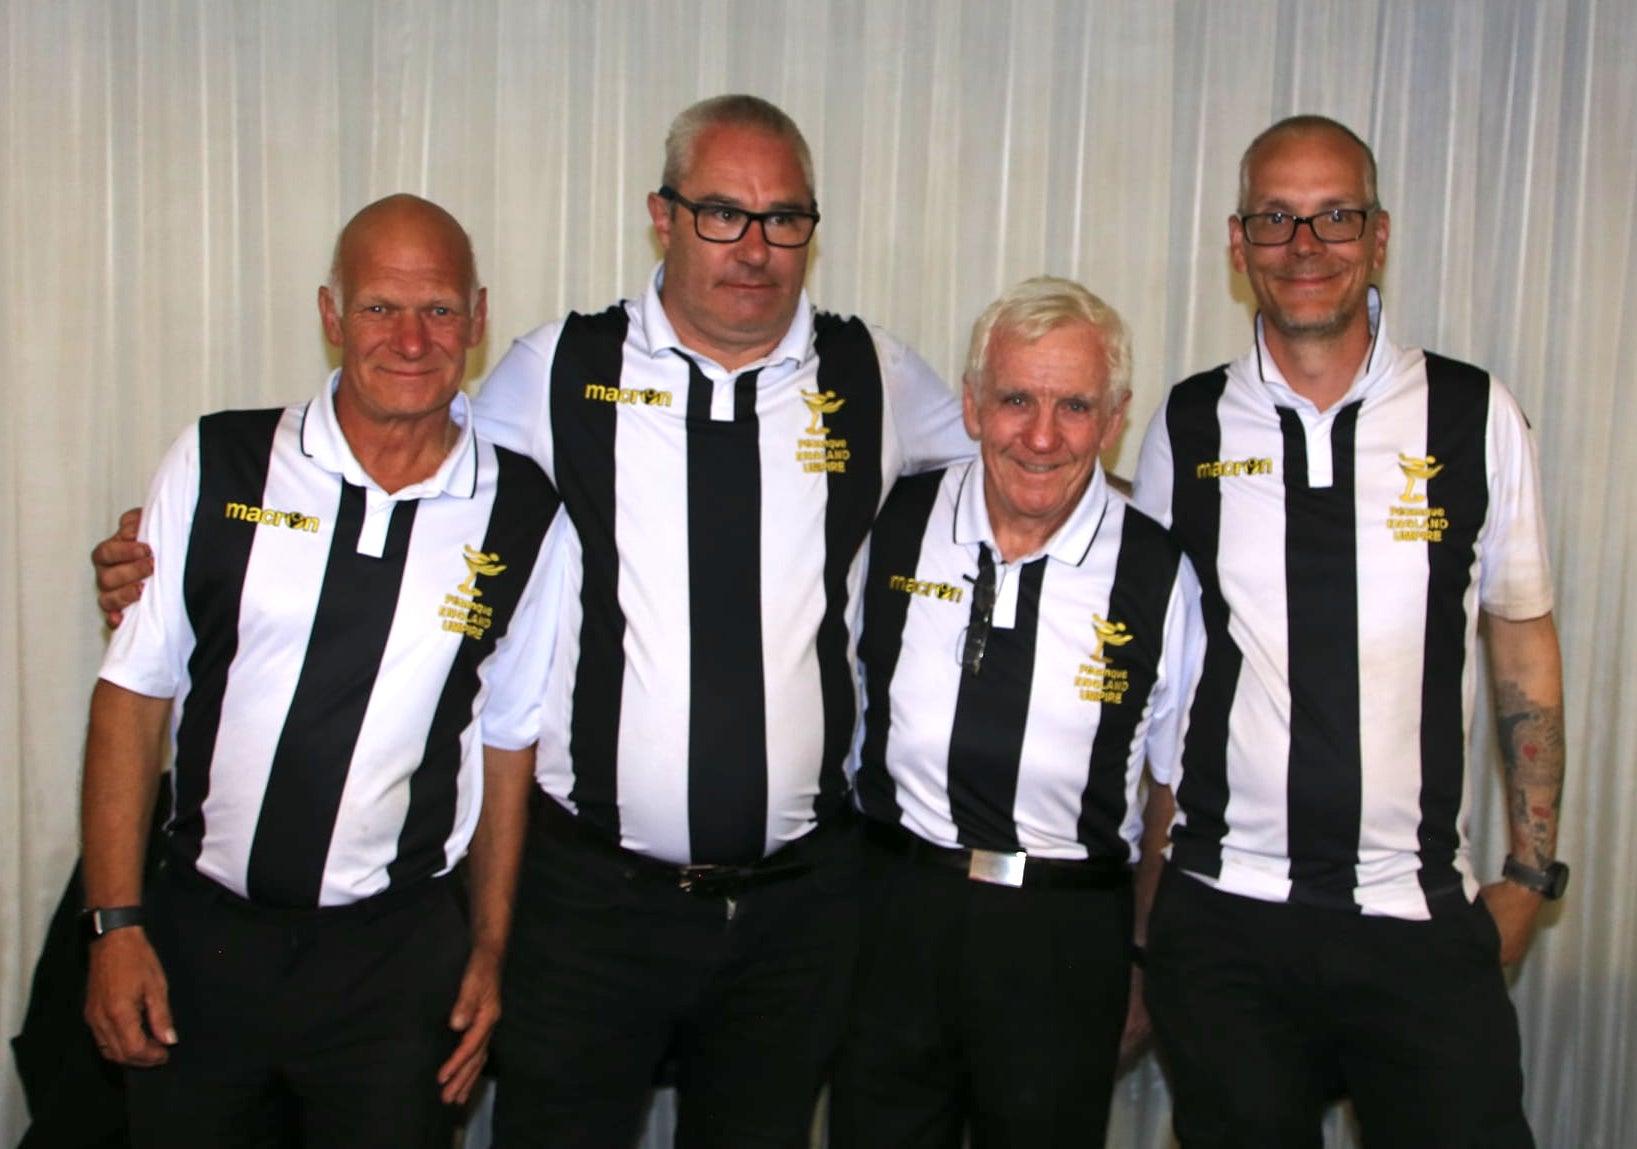 https://www.petanque-england.uk/wp-content/uploads/2021/09/PE-umpires-2021.jpg